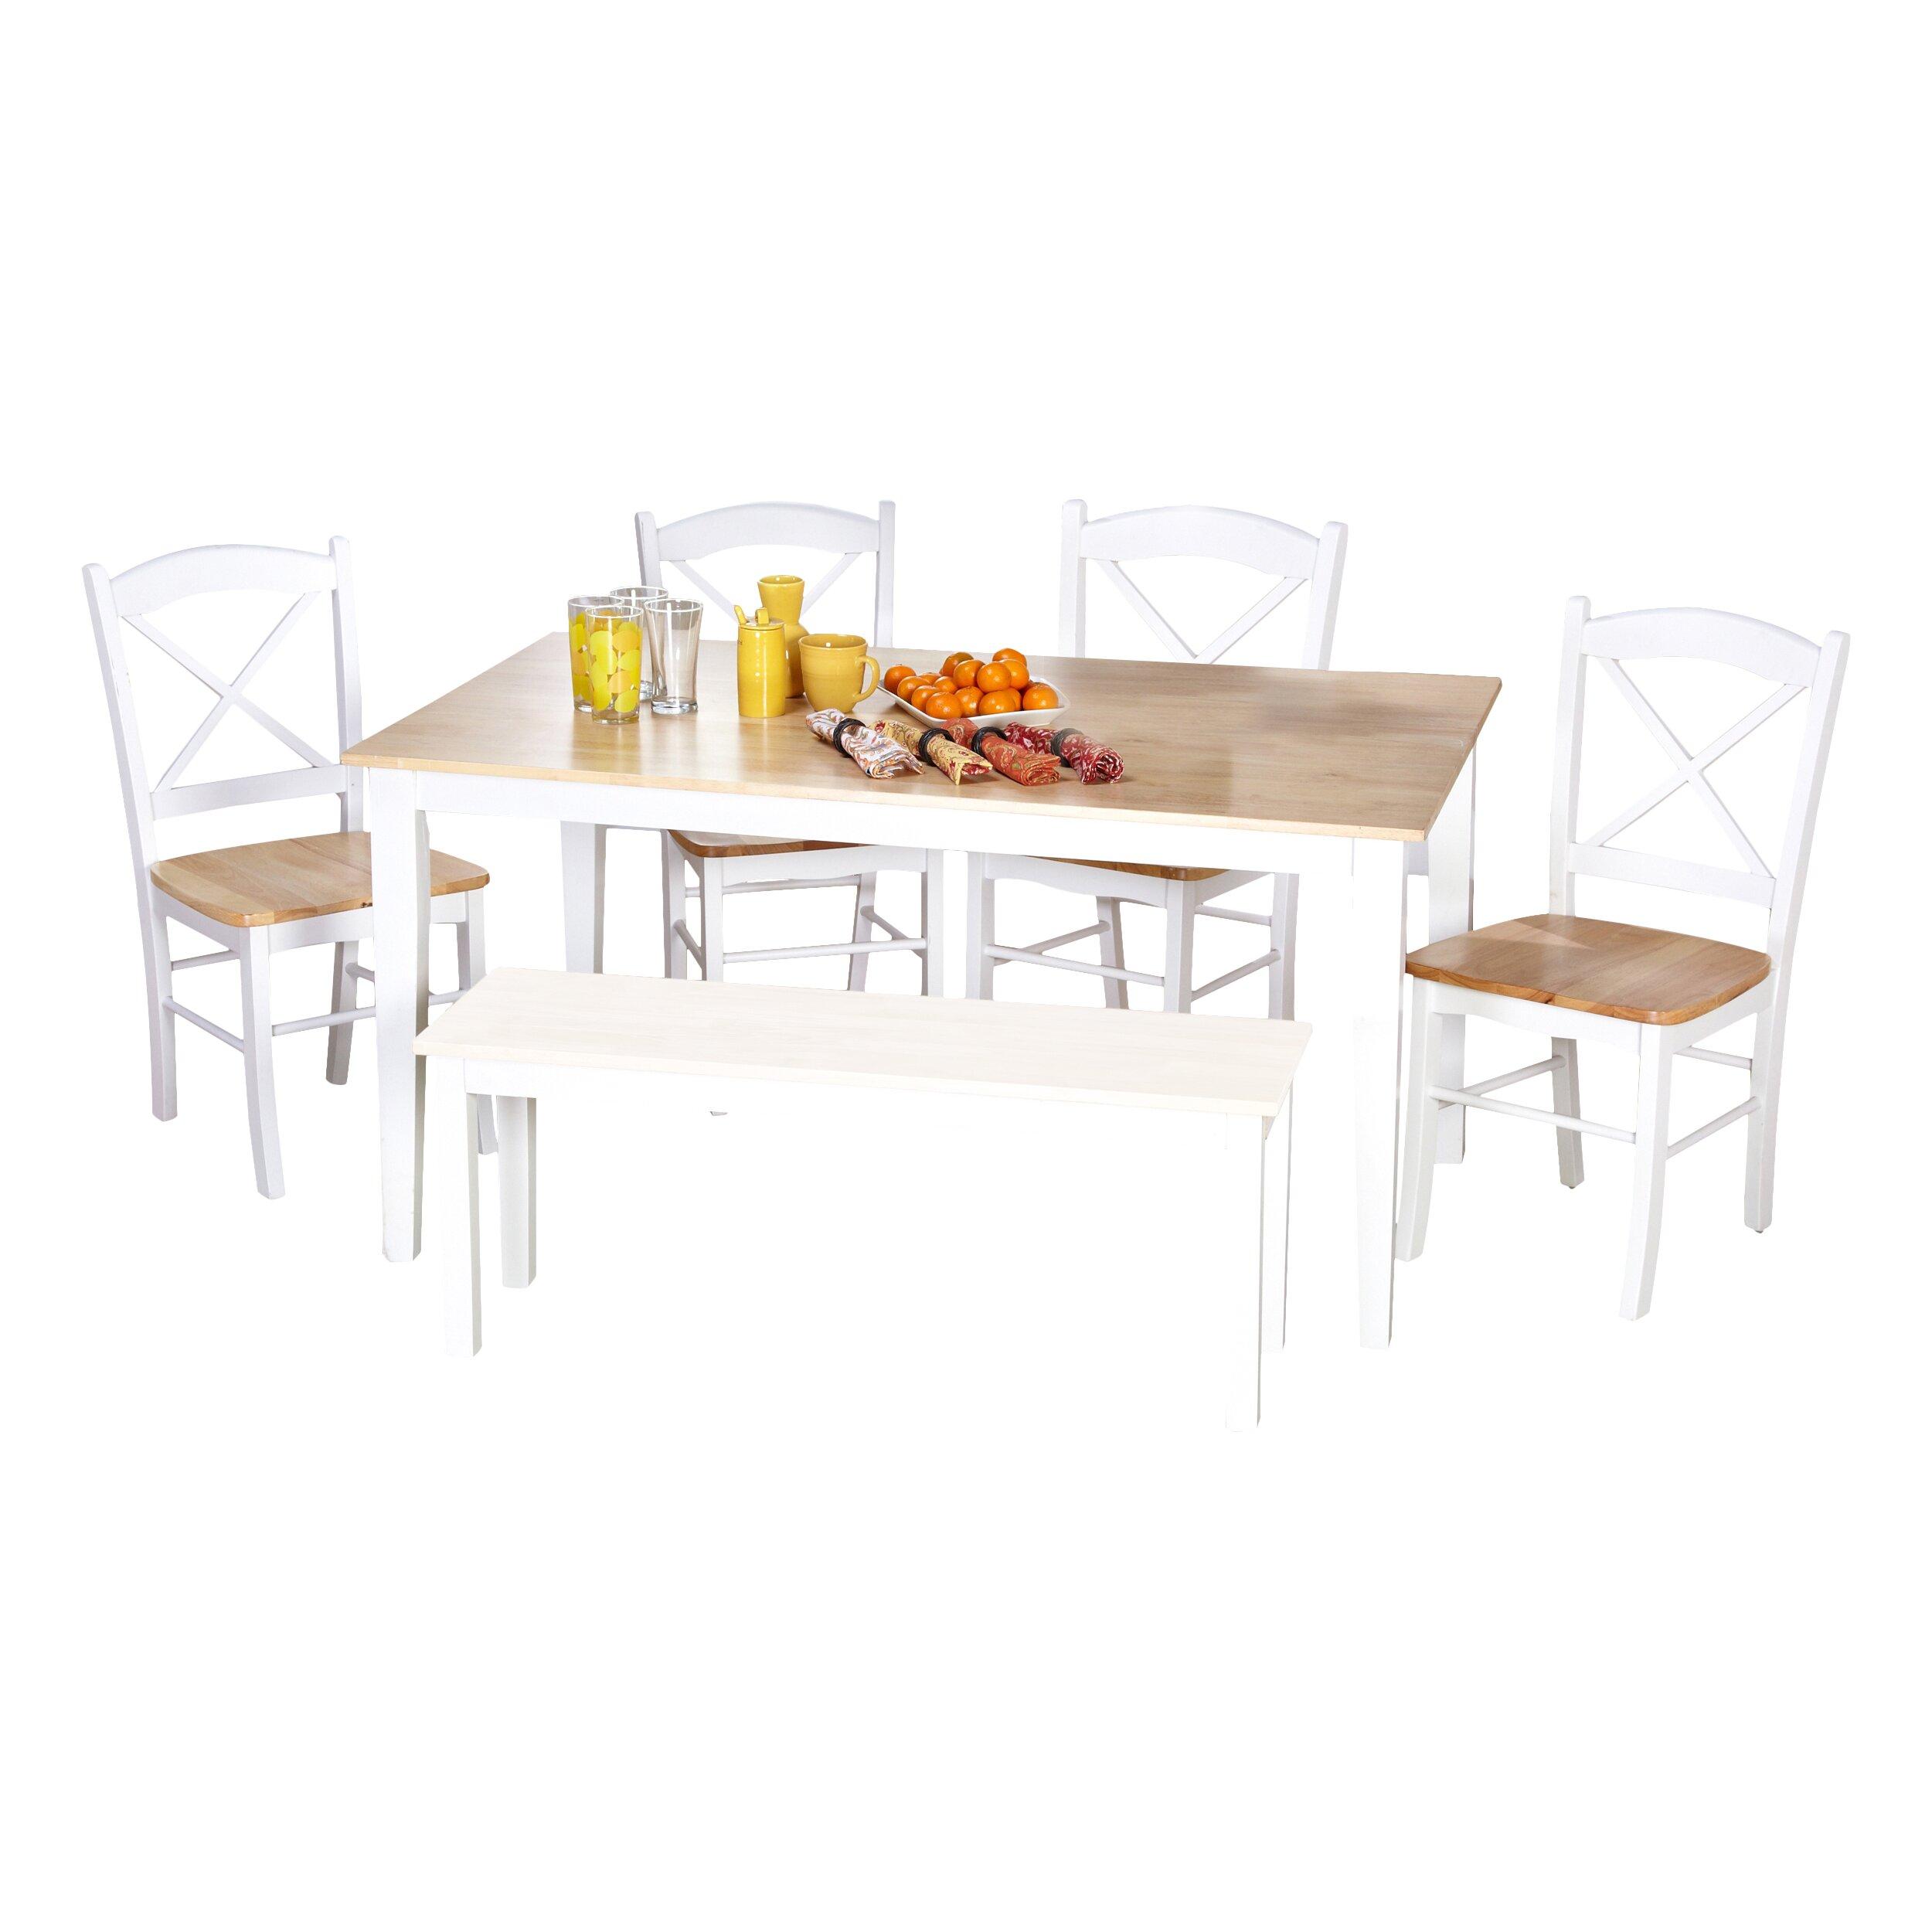 August grove wisteria 6 piece dining set reviews wayfair for 6 piece dining room set